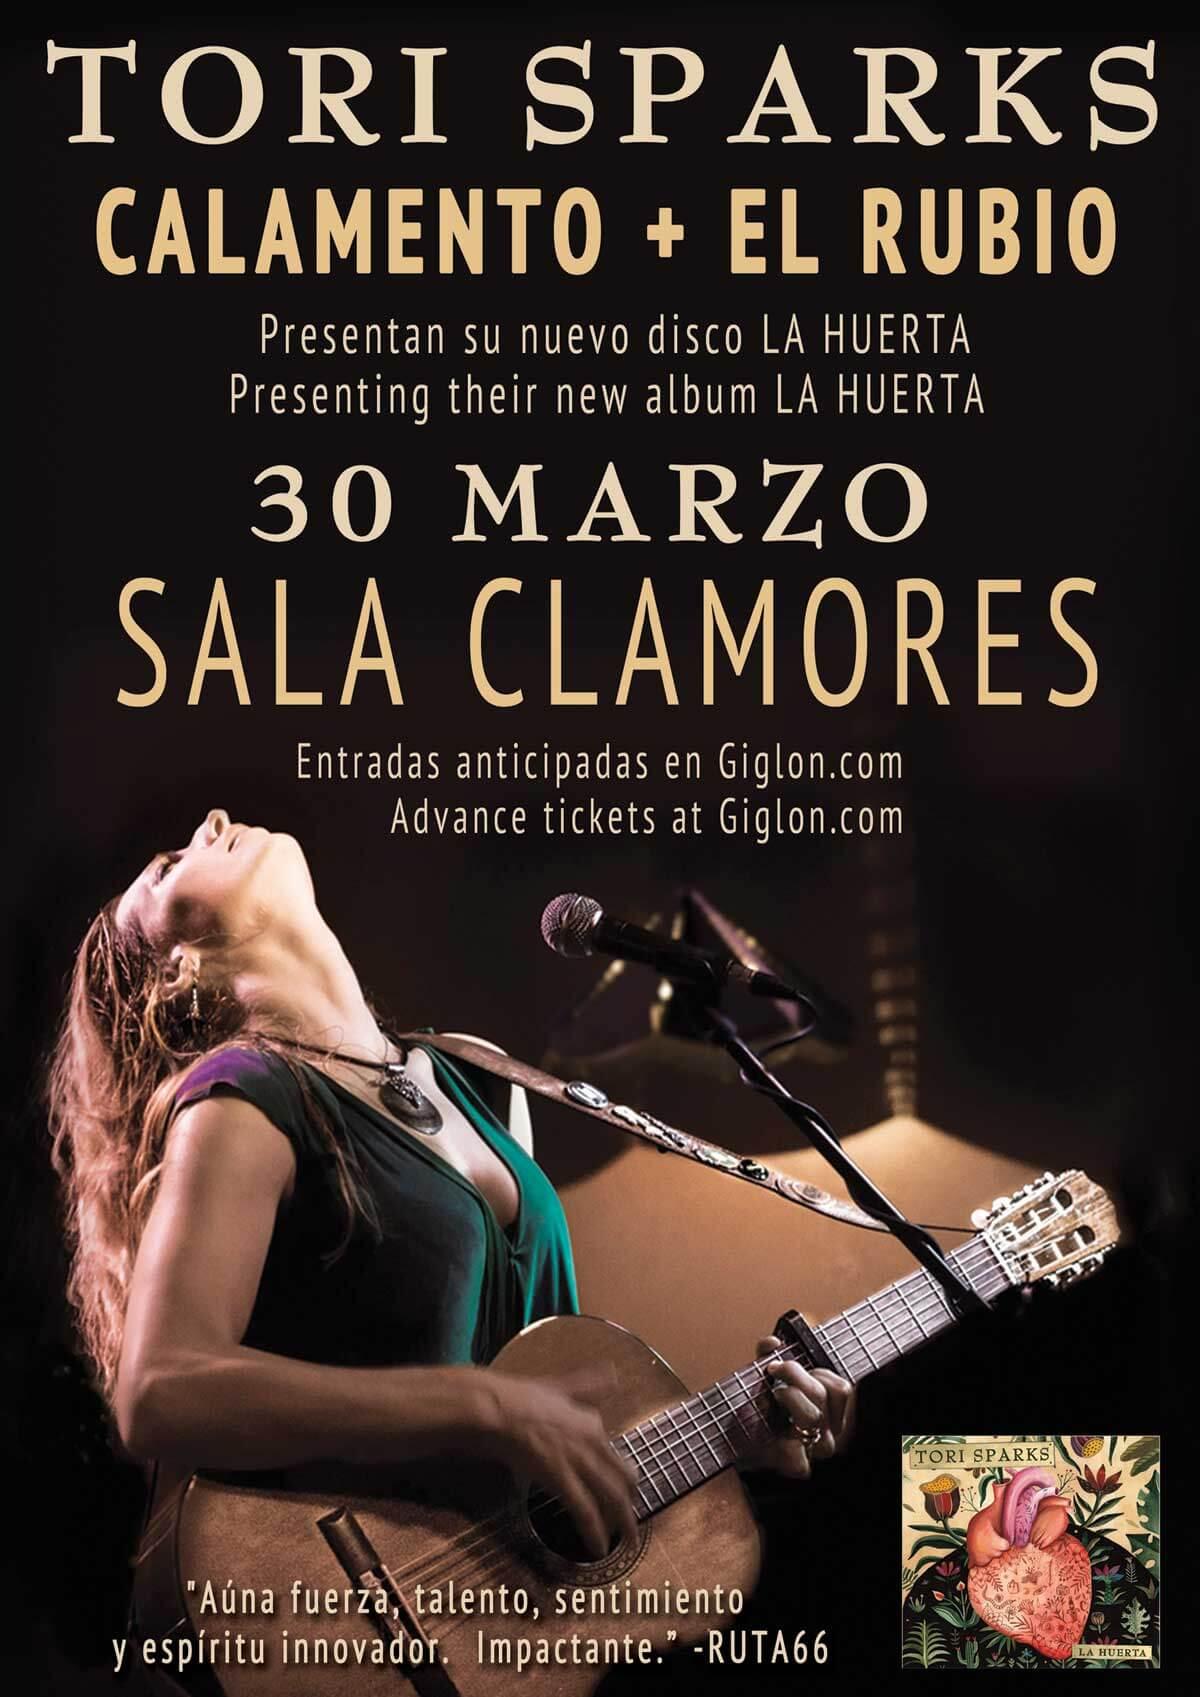 Tori Sparks La Huerta Concert Poster, Madrid, Spain